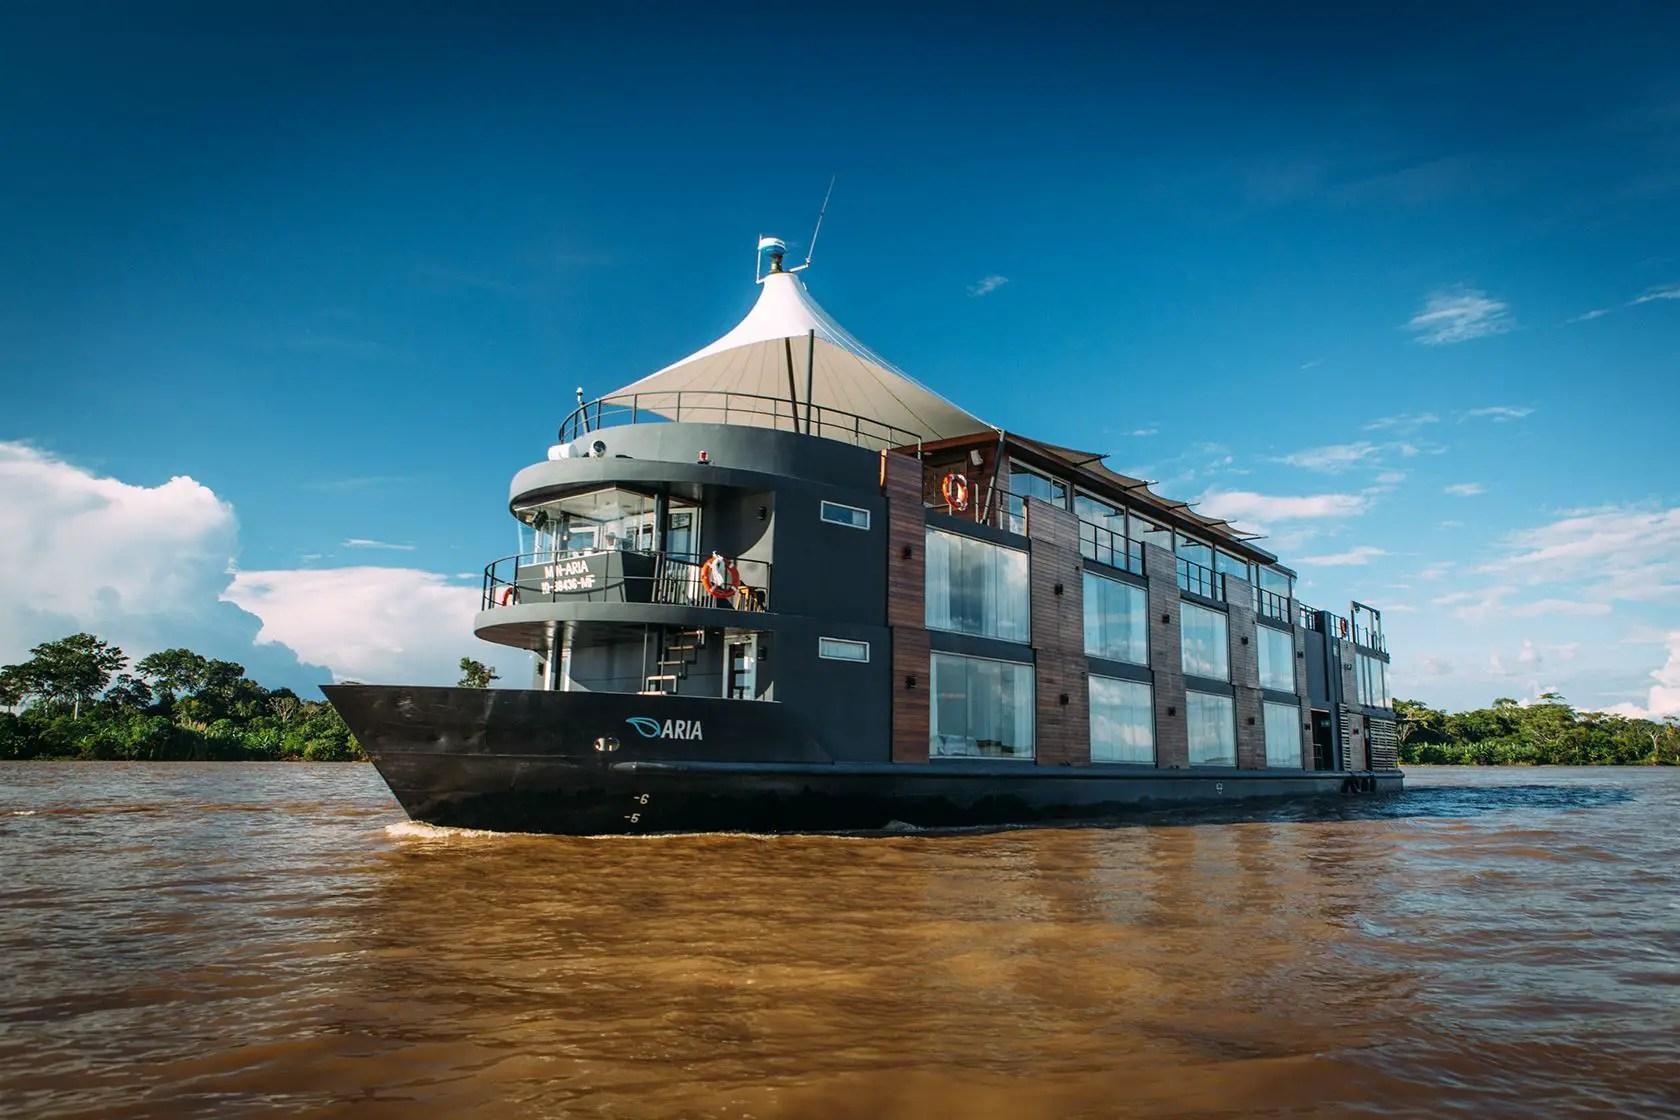 5 Best Ways to Explore the Amazon River